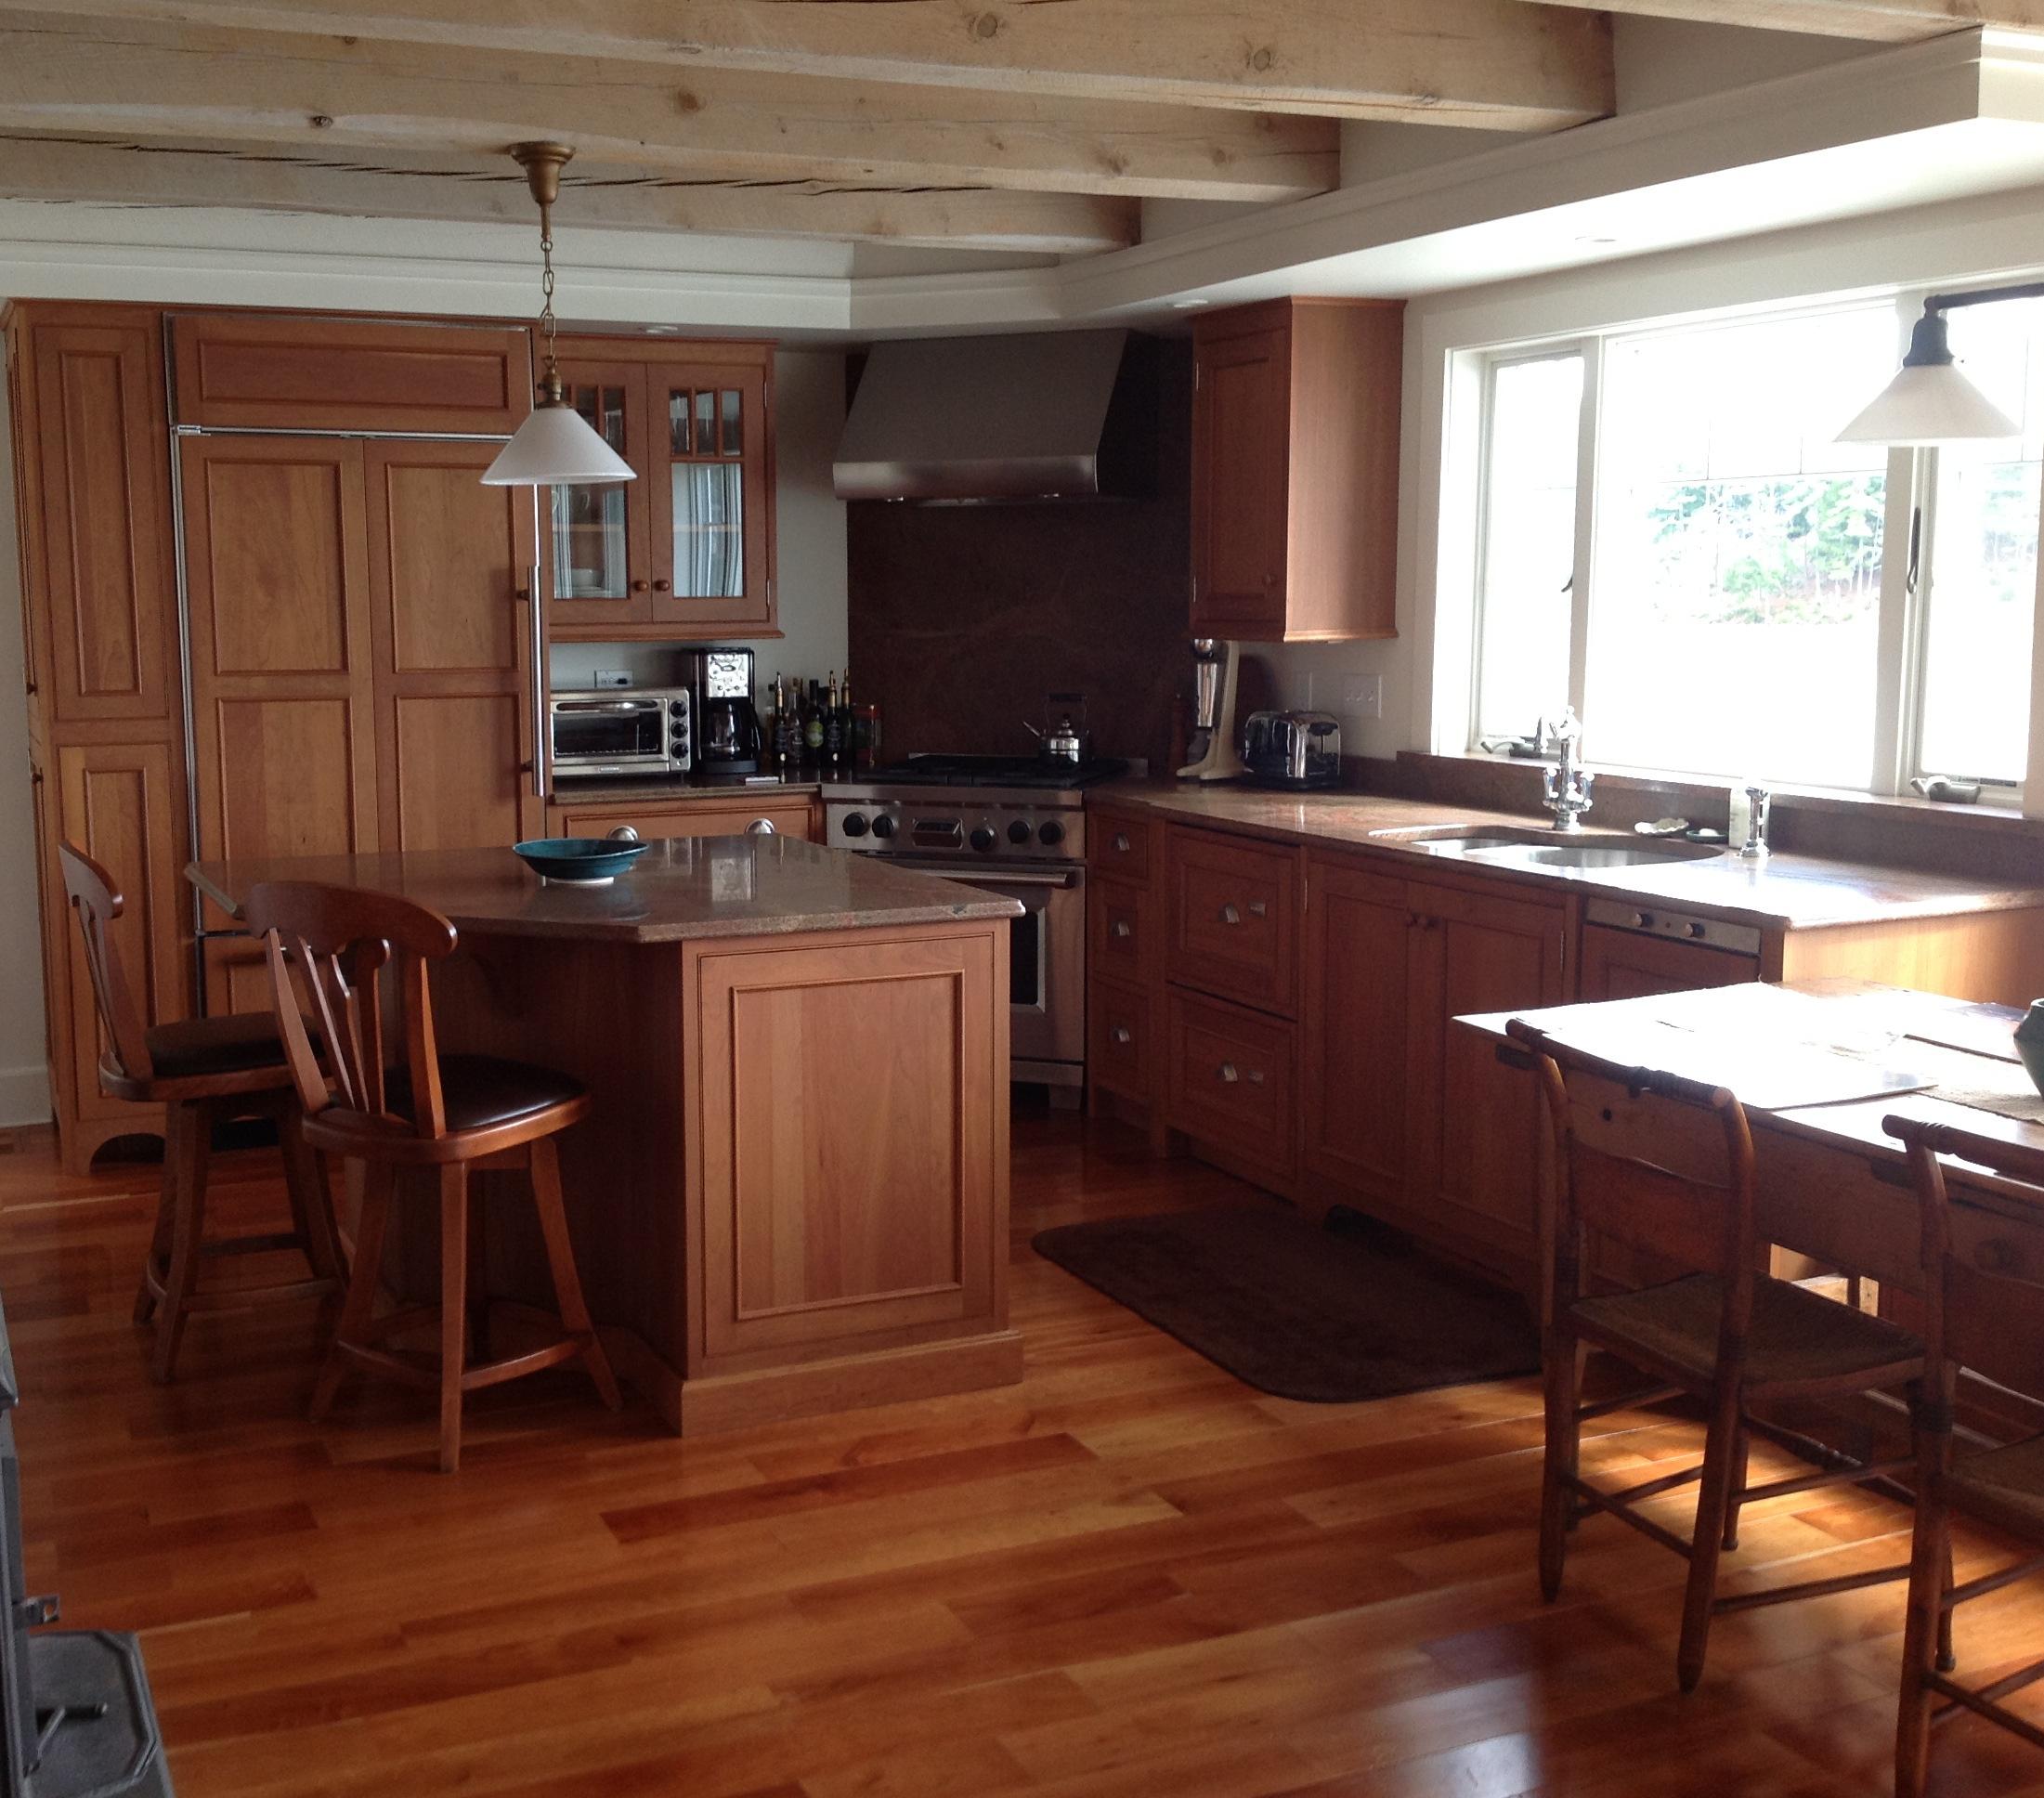 Dream Kitchen Rockland Maine: Kitchen Design Services For Midcoast Maine